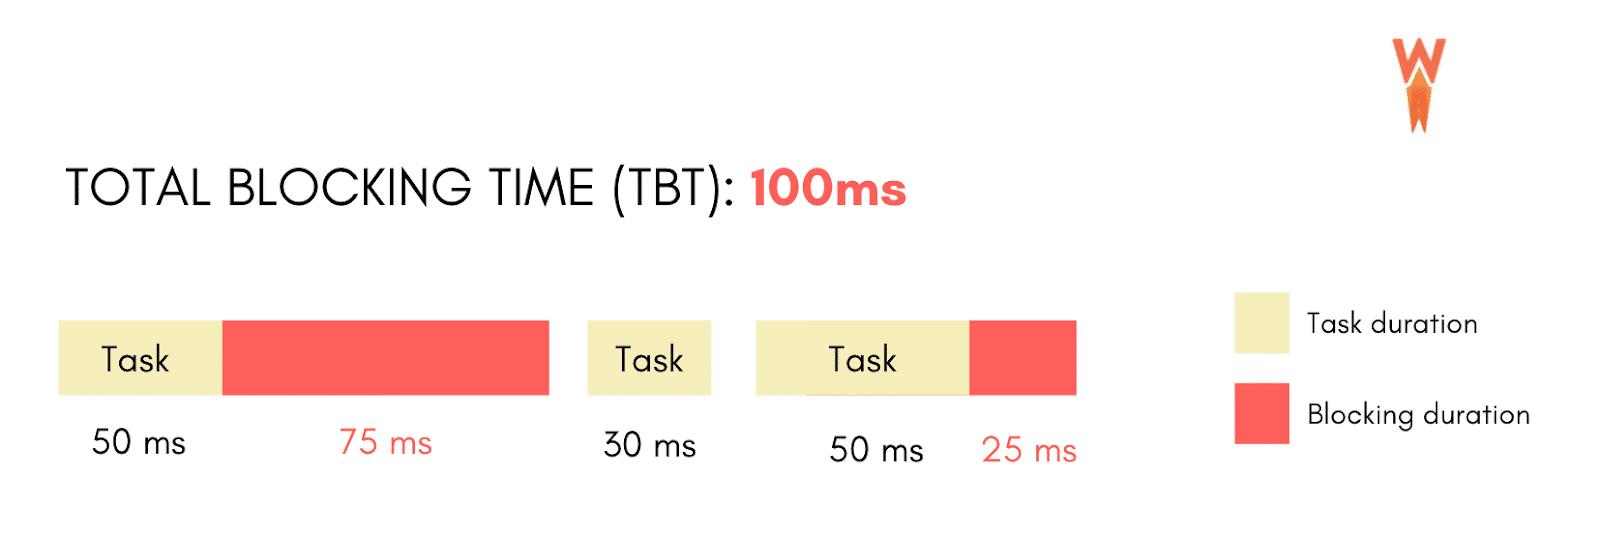 Total Blocking Time - Example